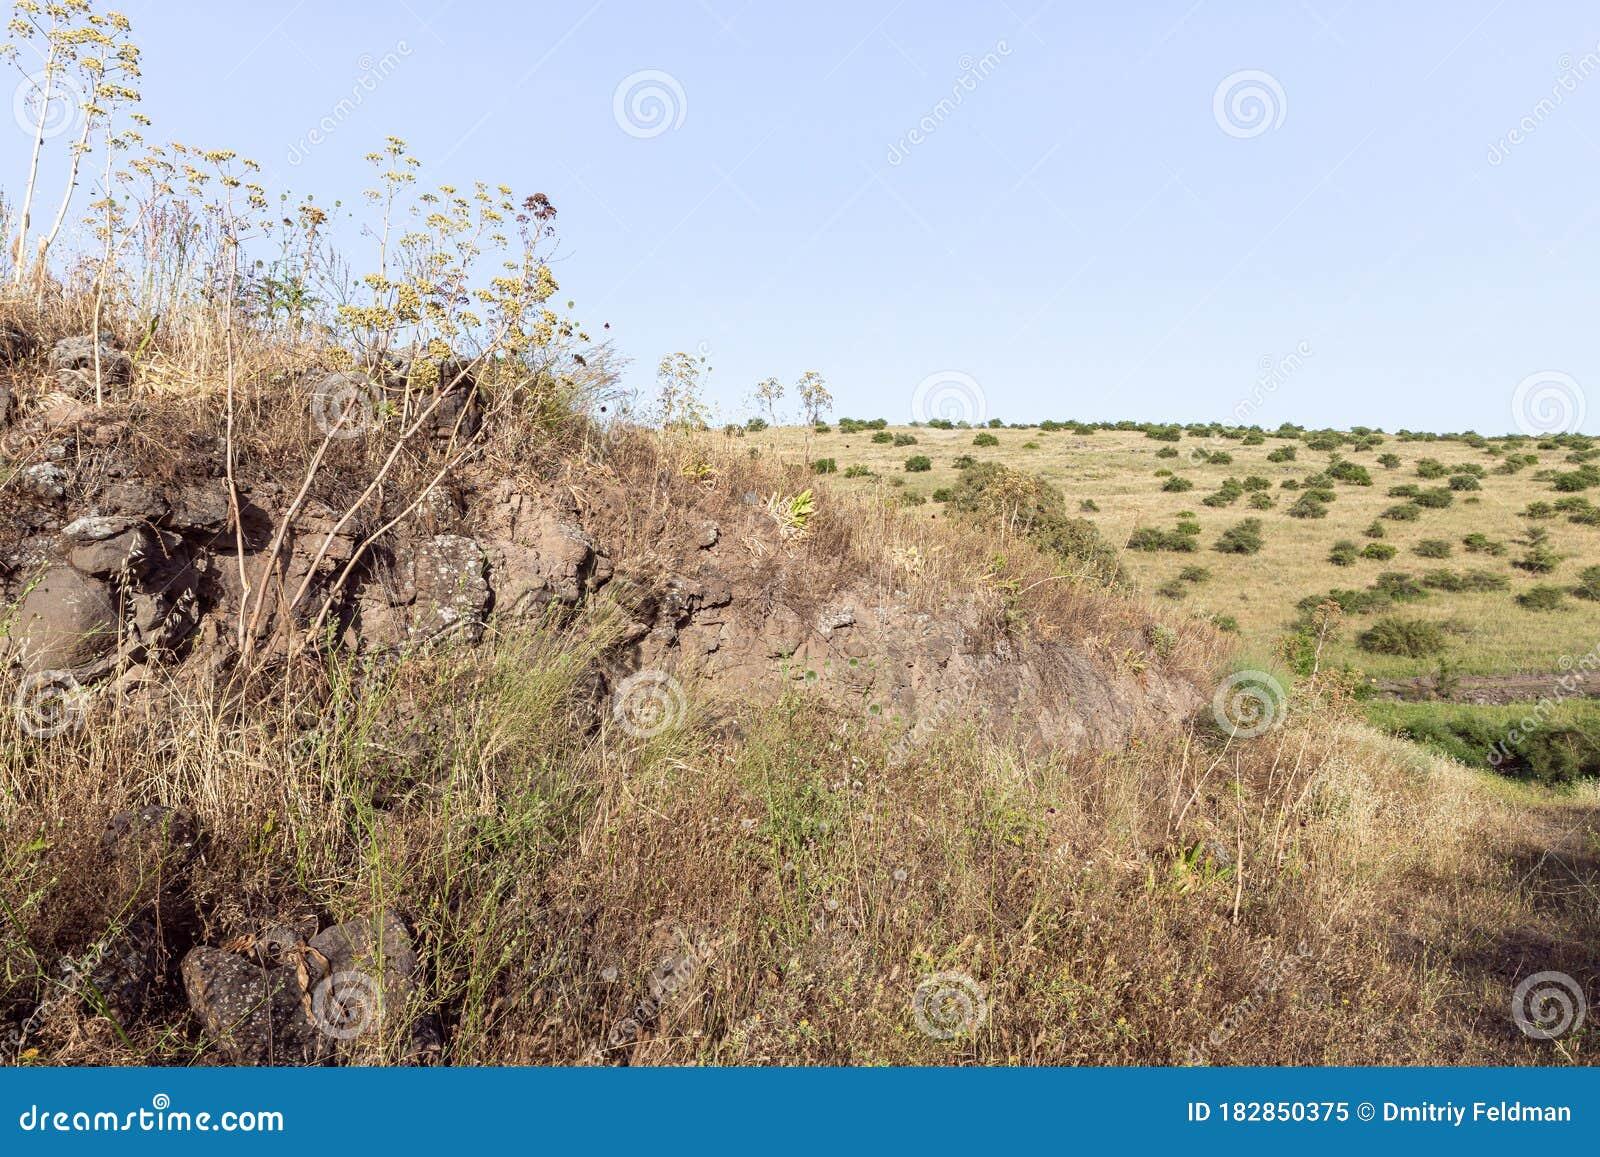 Grass Israel